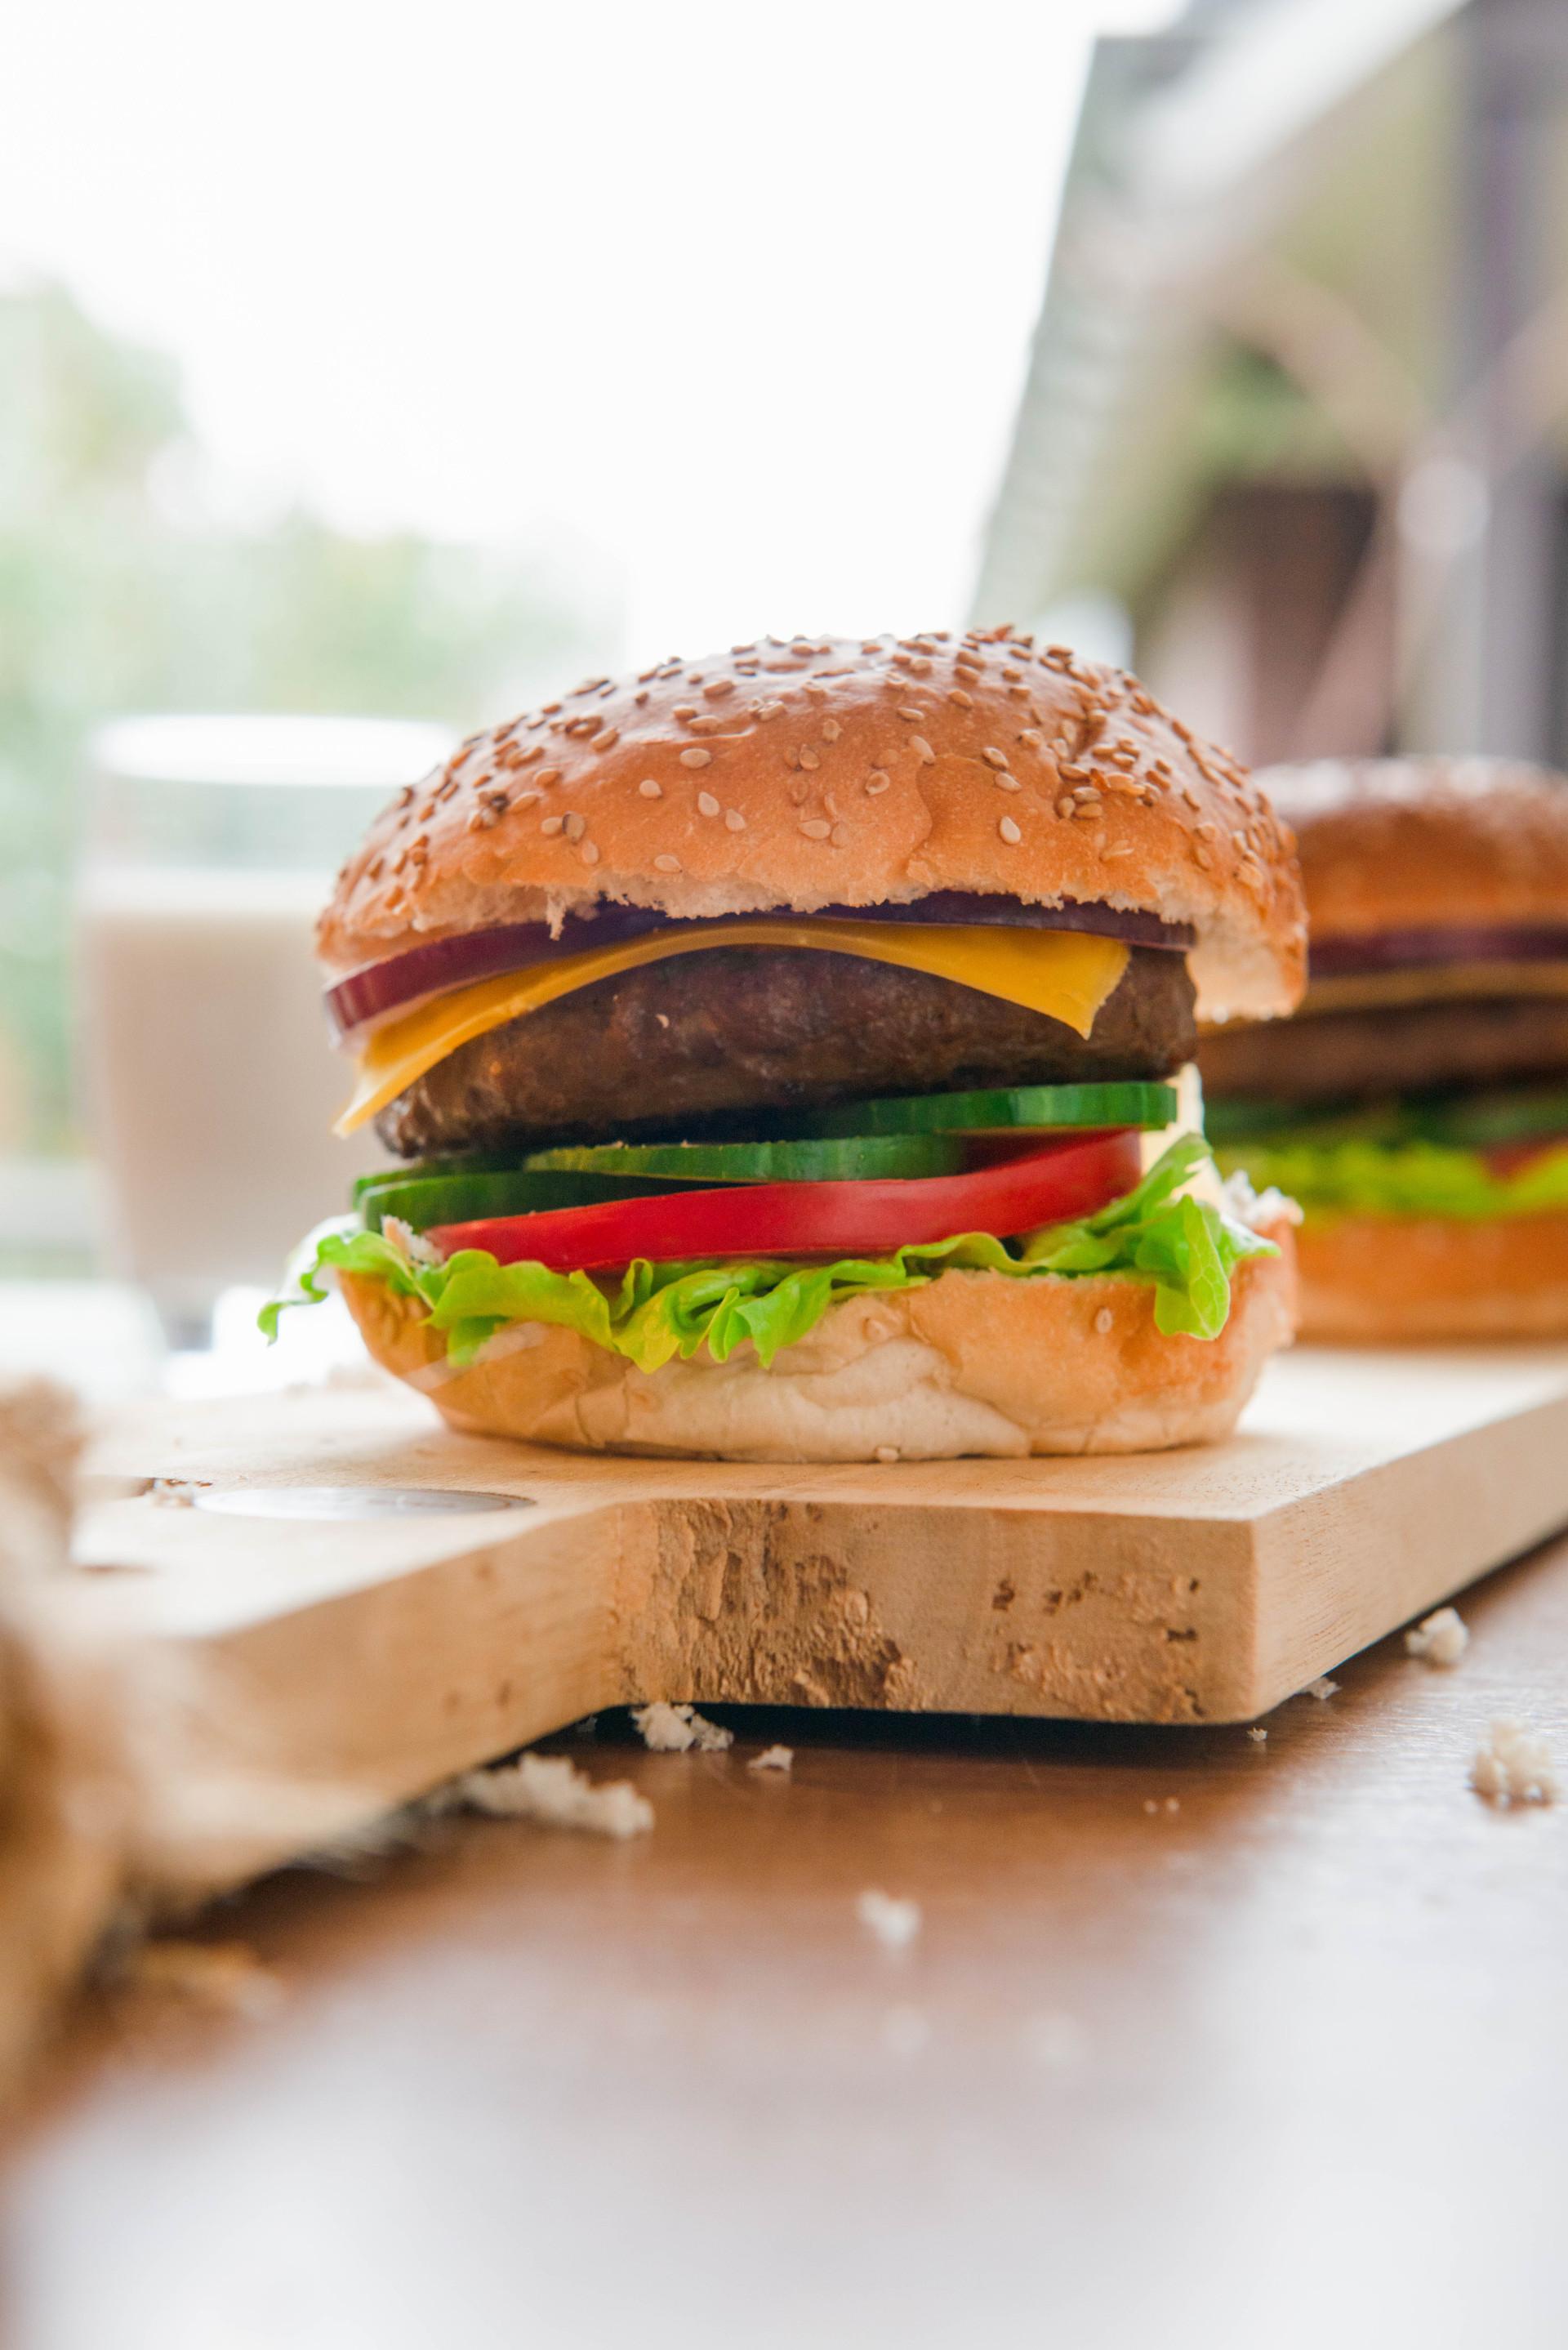 19110717rvb_hamburger.jpg